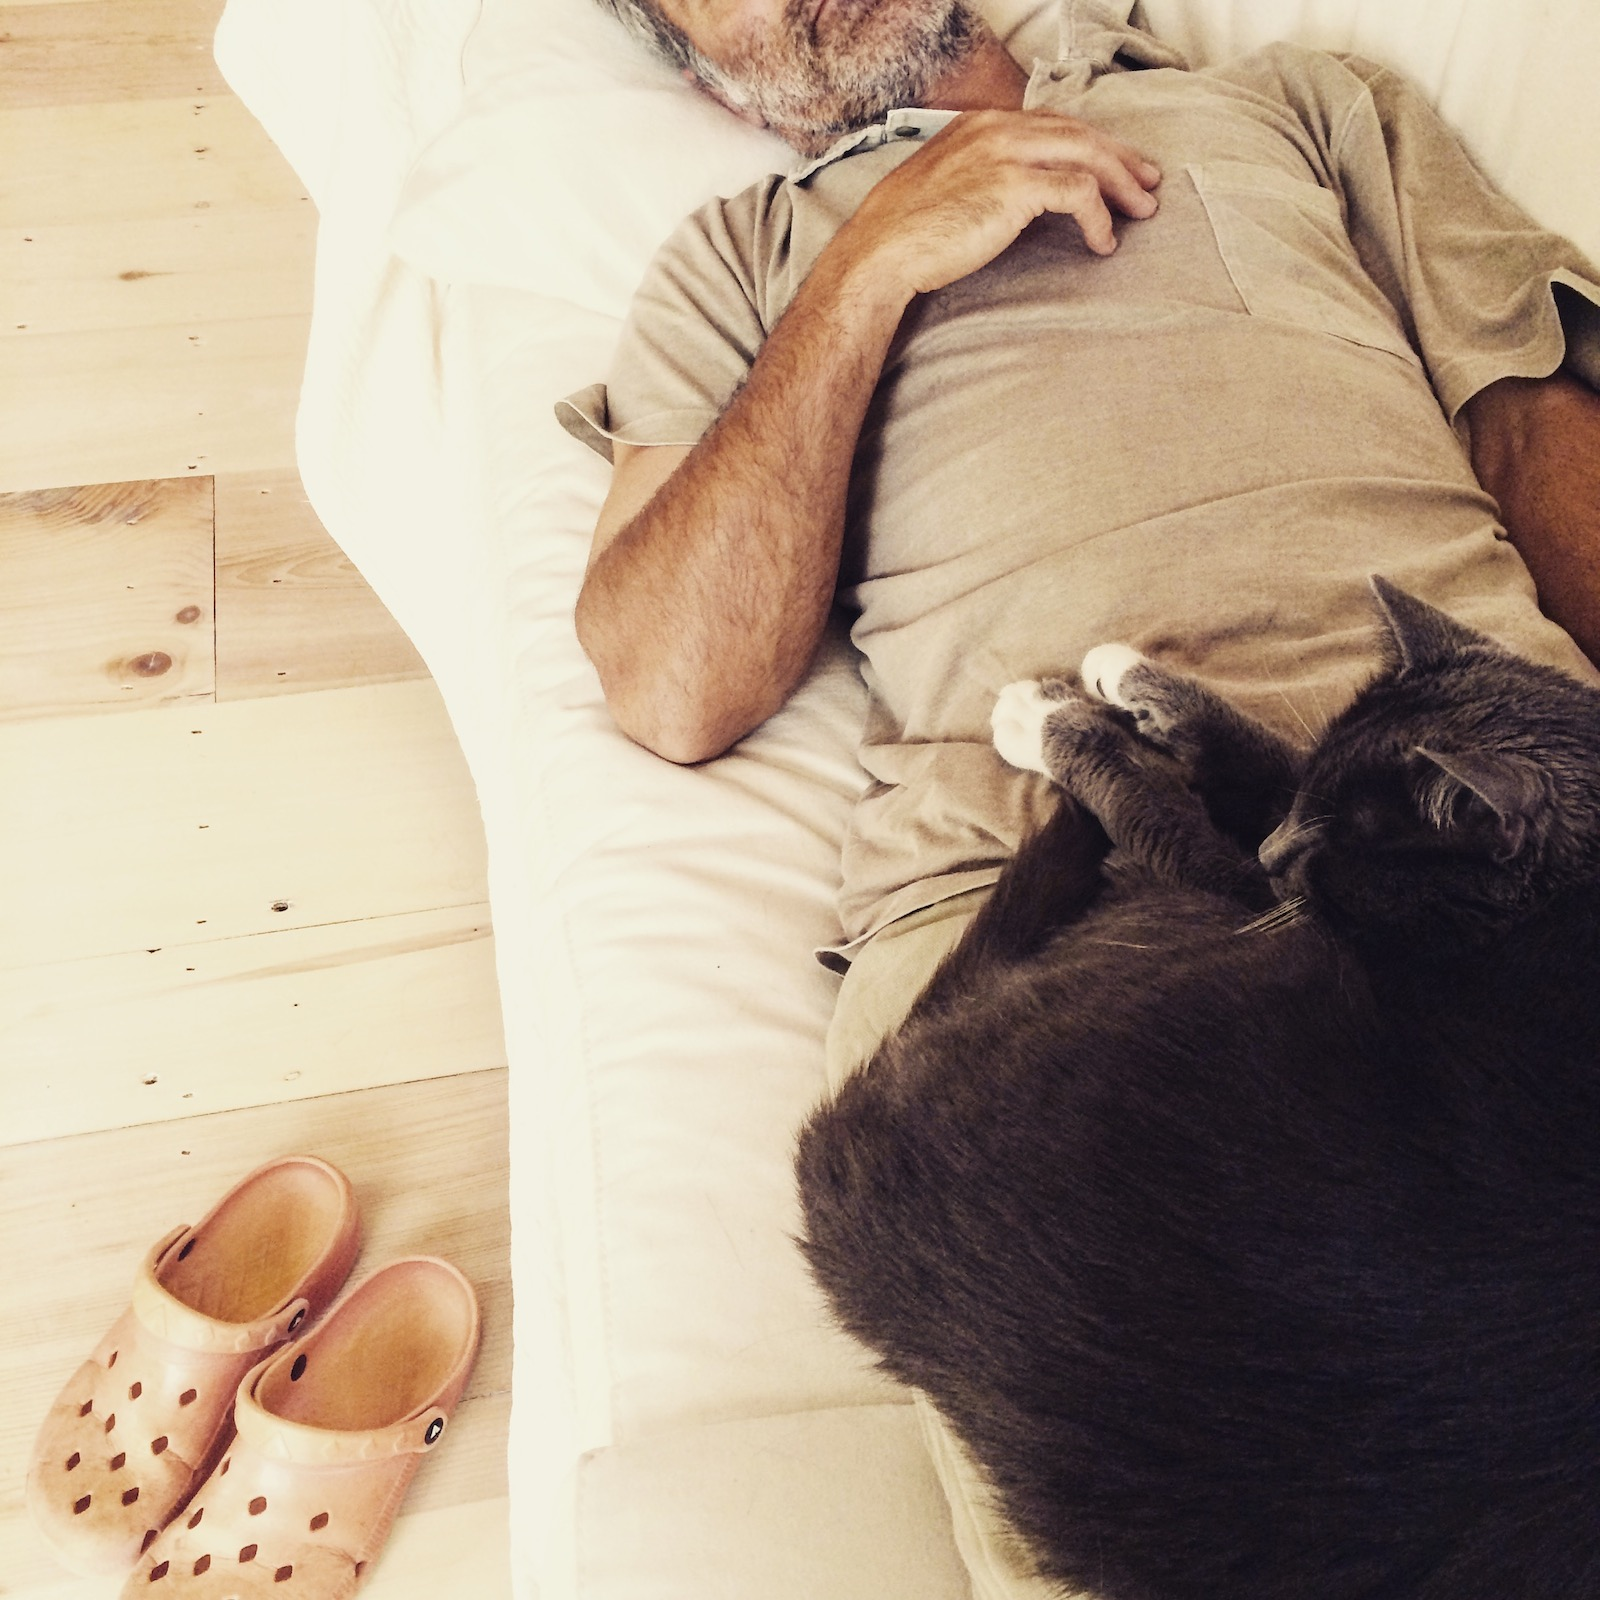 Sleepy Sunday in Maine with Kitties and crocs